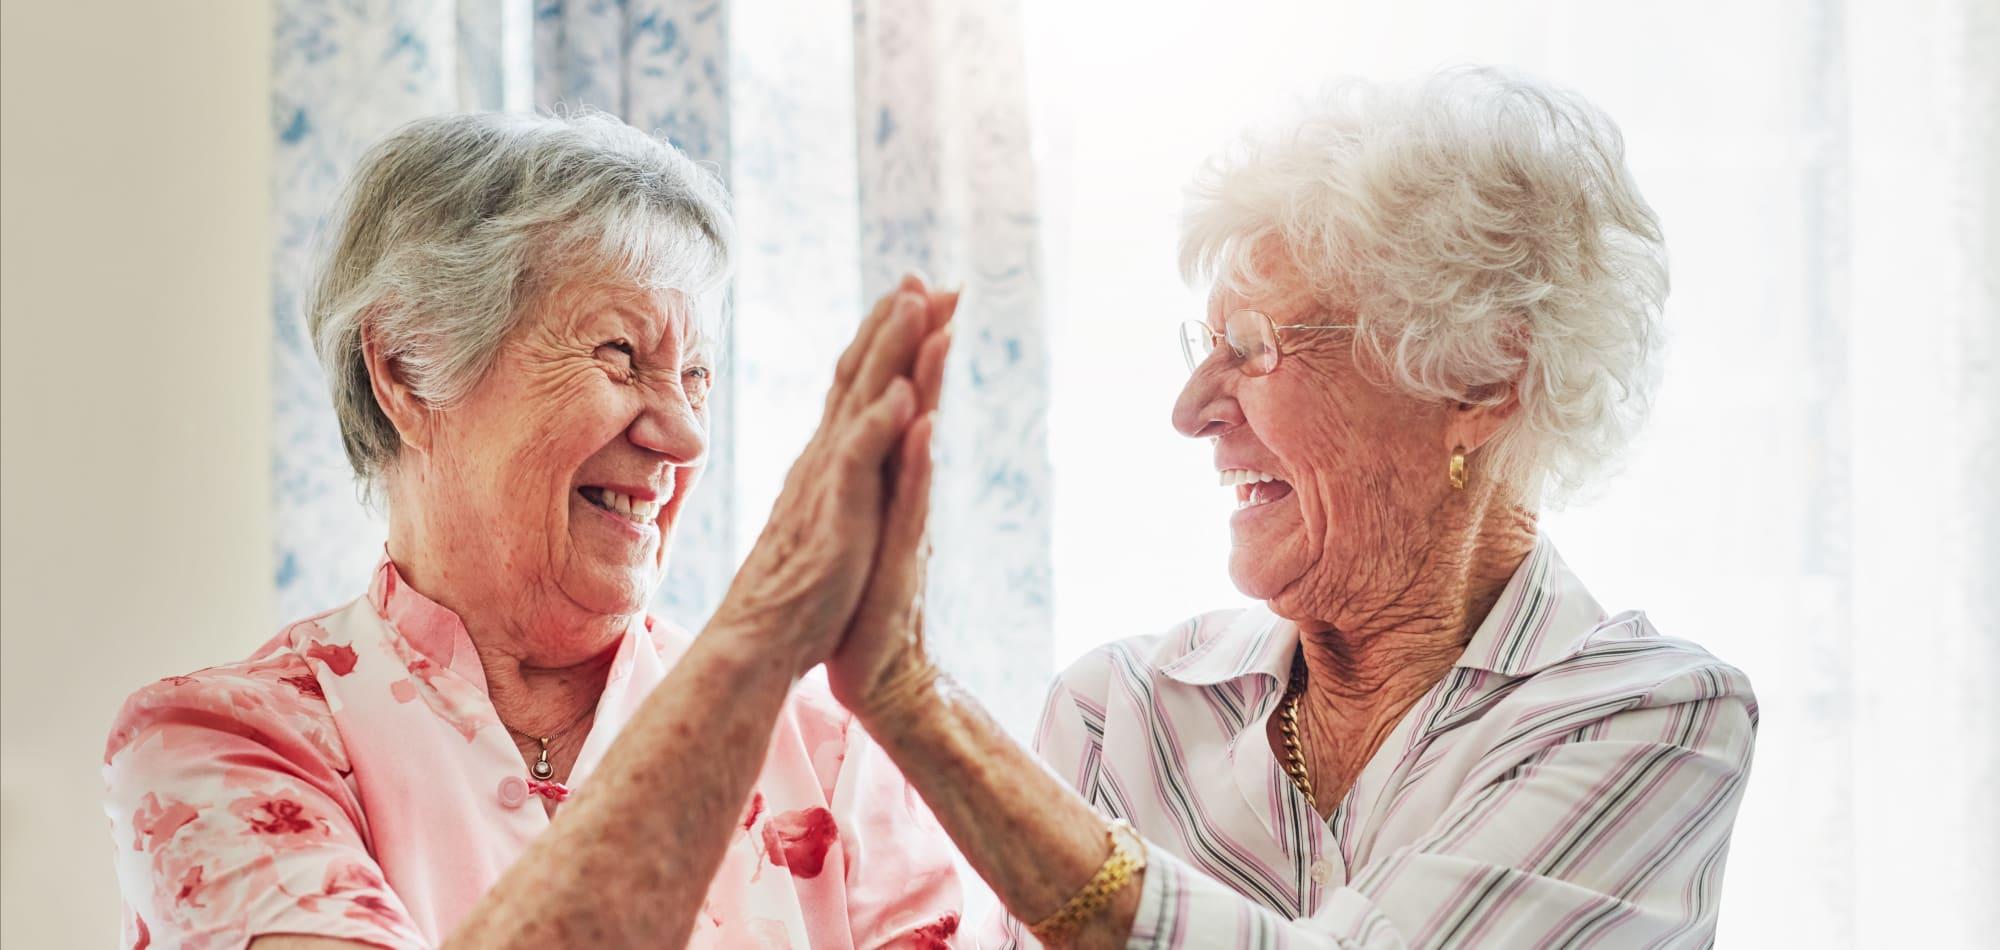 Respite care at Milestone Senior Living in Faribault, Minnesota.